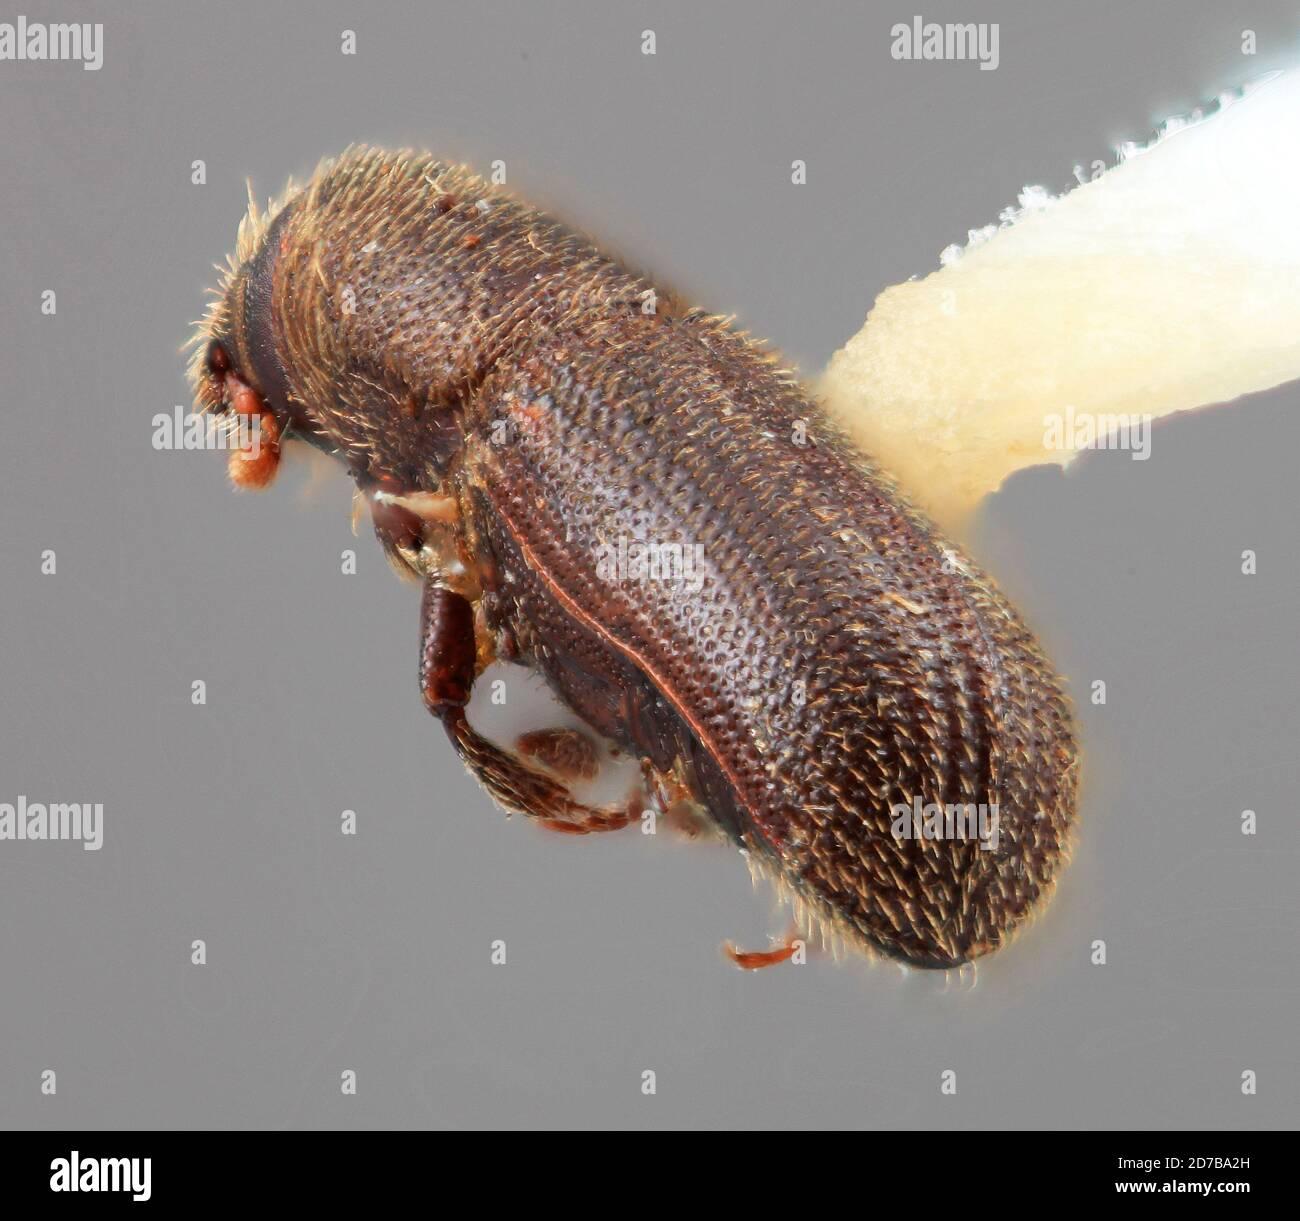 Pinned, W. Almora, Kumaon U.P. July 1916 HGC, India, Hylurgus indicus Wood, 1985, Animalia, Arthropoda, Insecta, Coleoptera, Curculionidae, Scolytinae Stock Photo